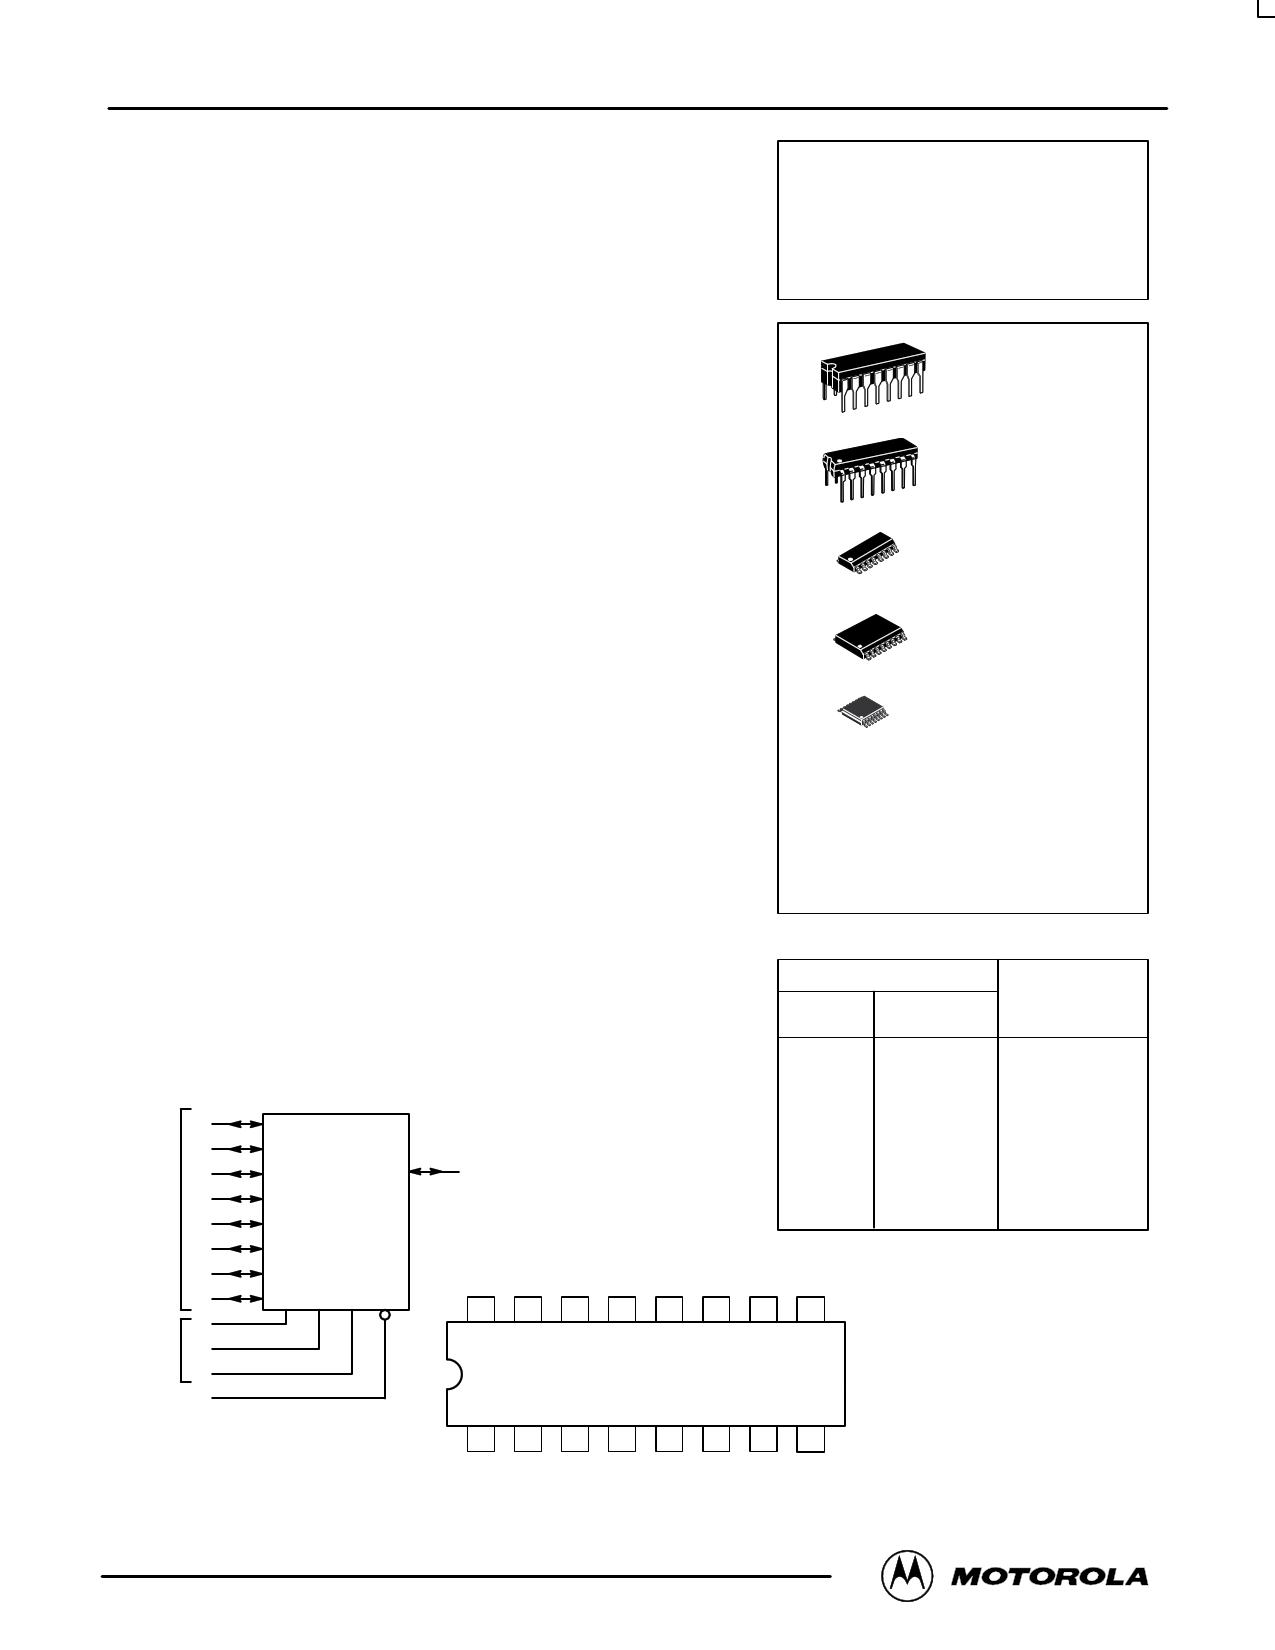 74HC4053A image